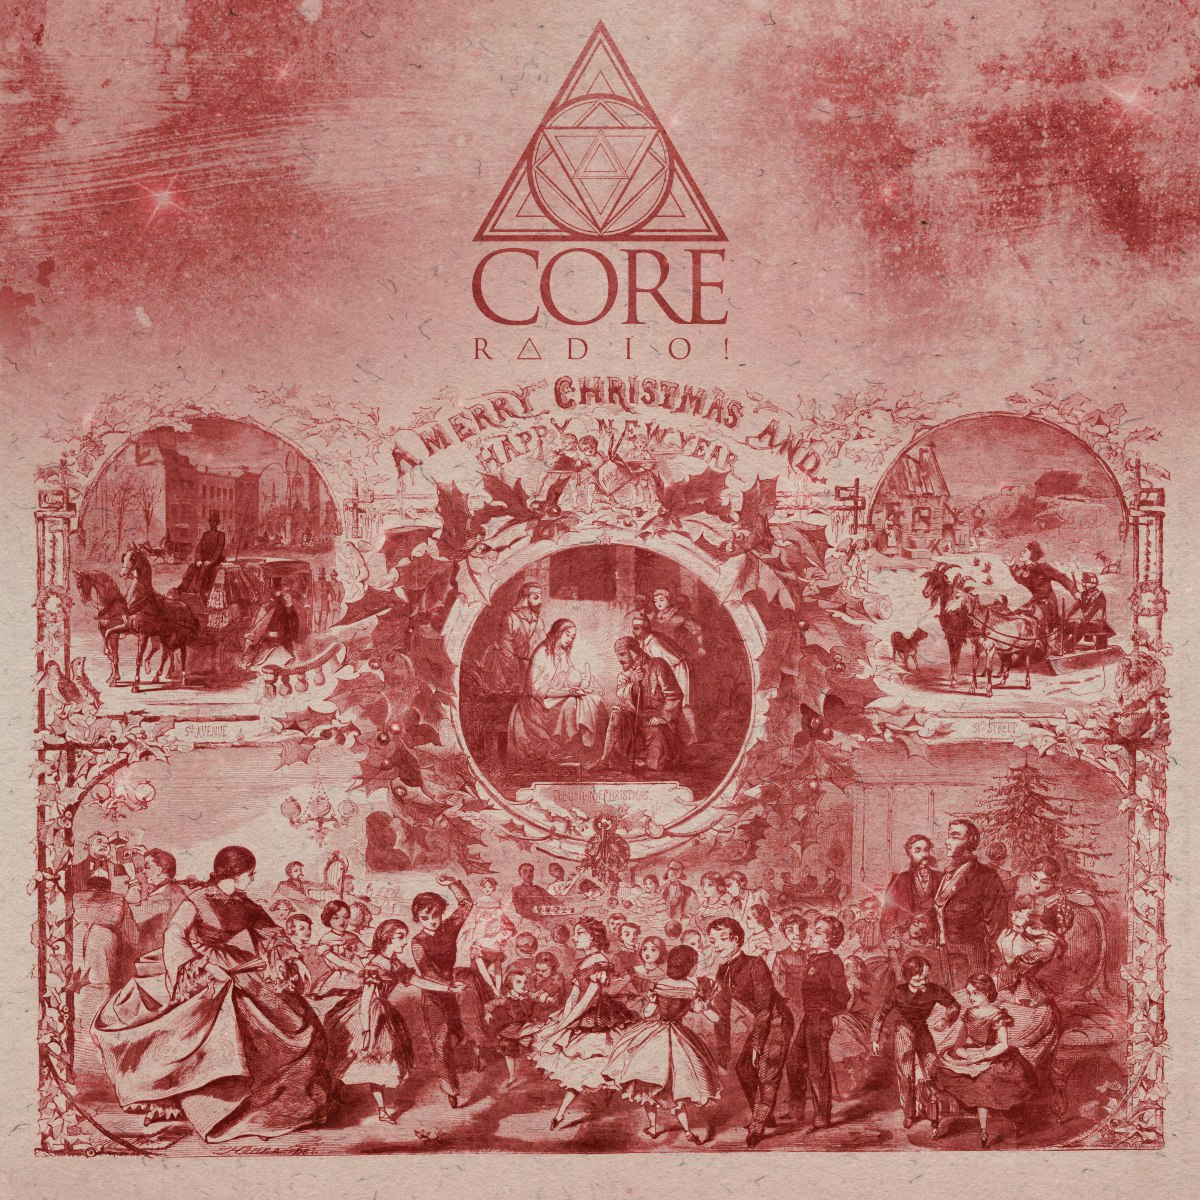 CORE RADIO! - Christmas Compilation 1.0 (2015)